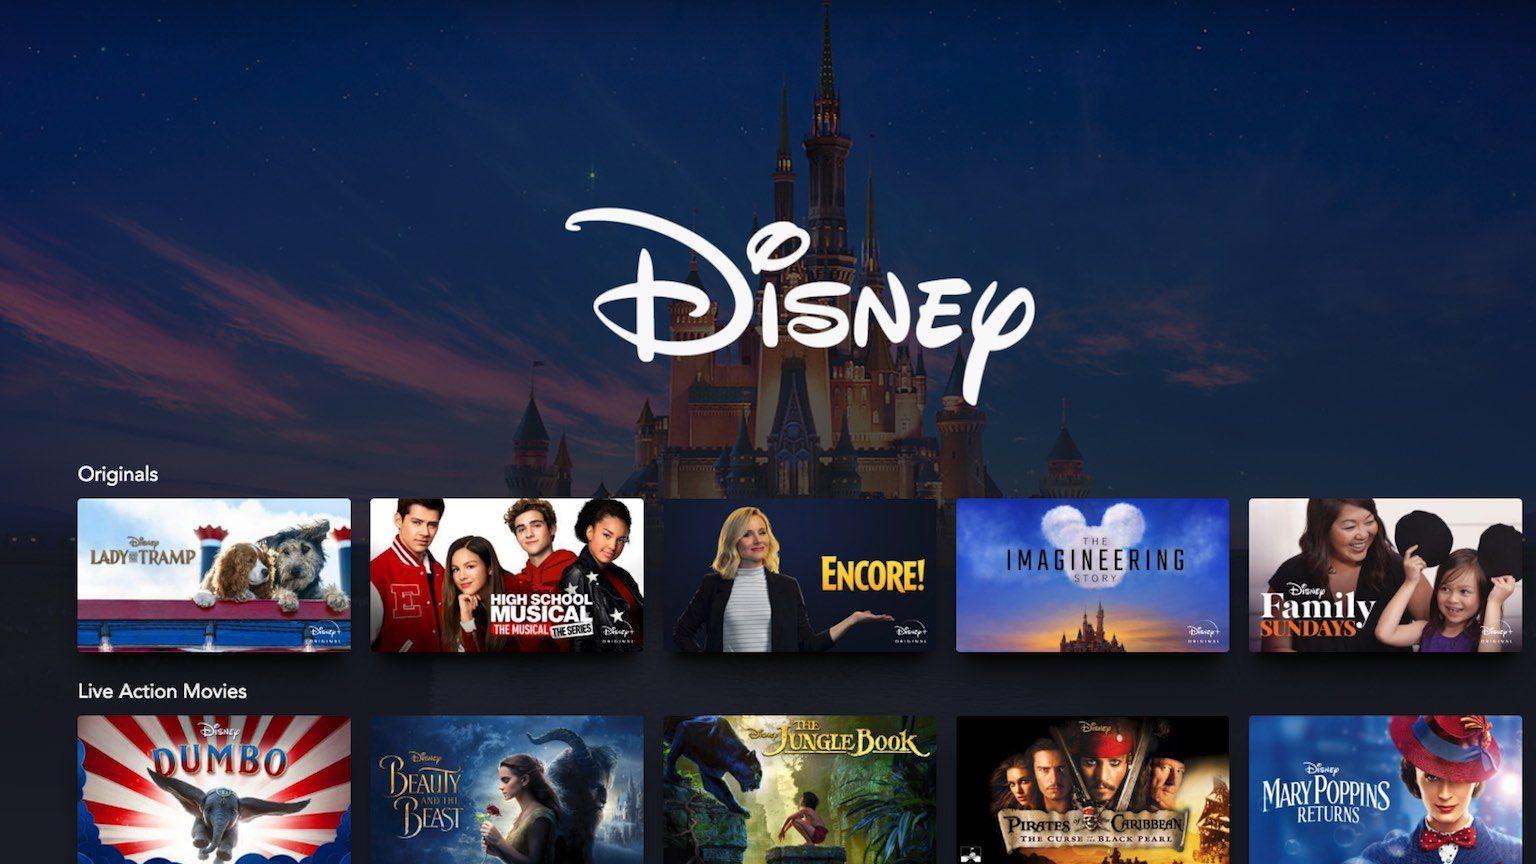 Disney content on Disney+ screen